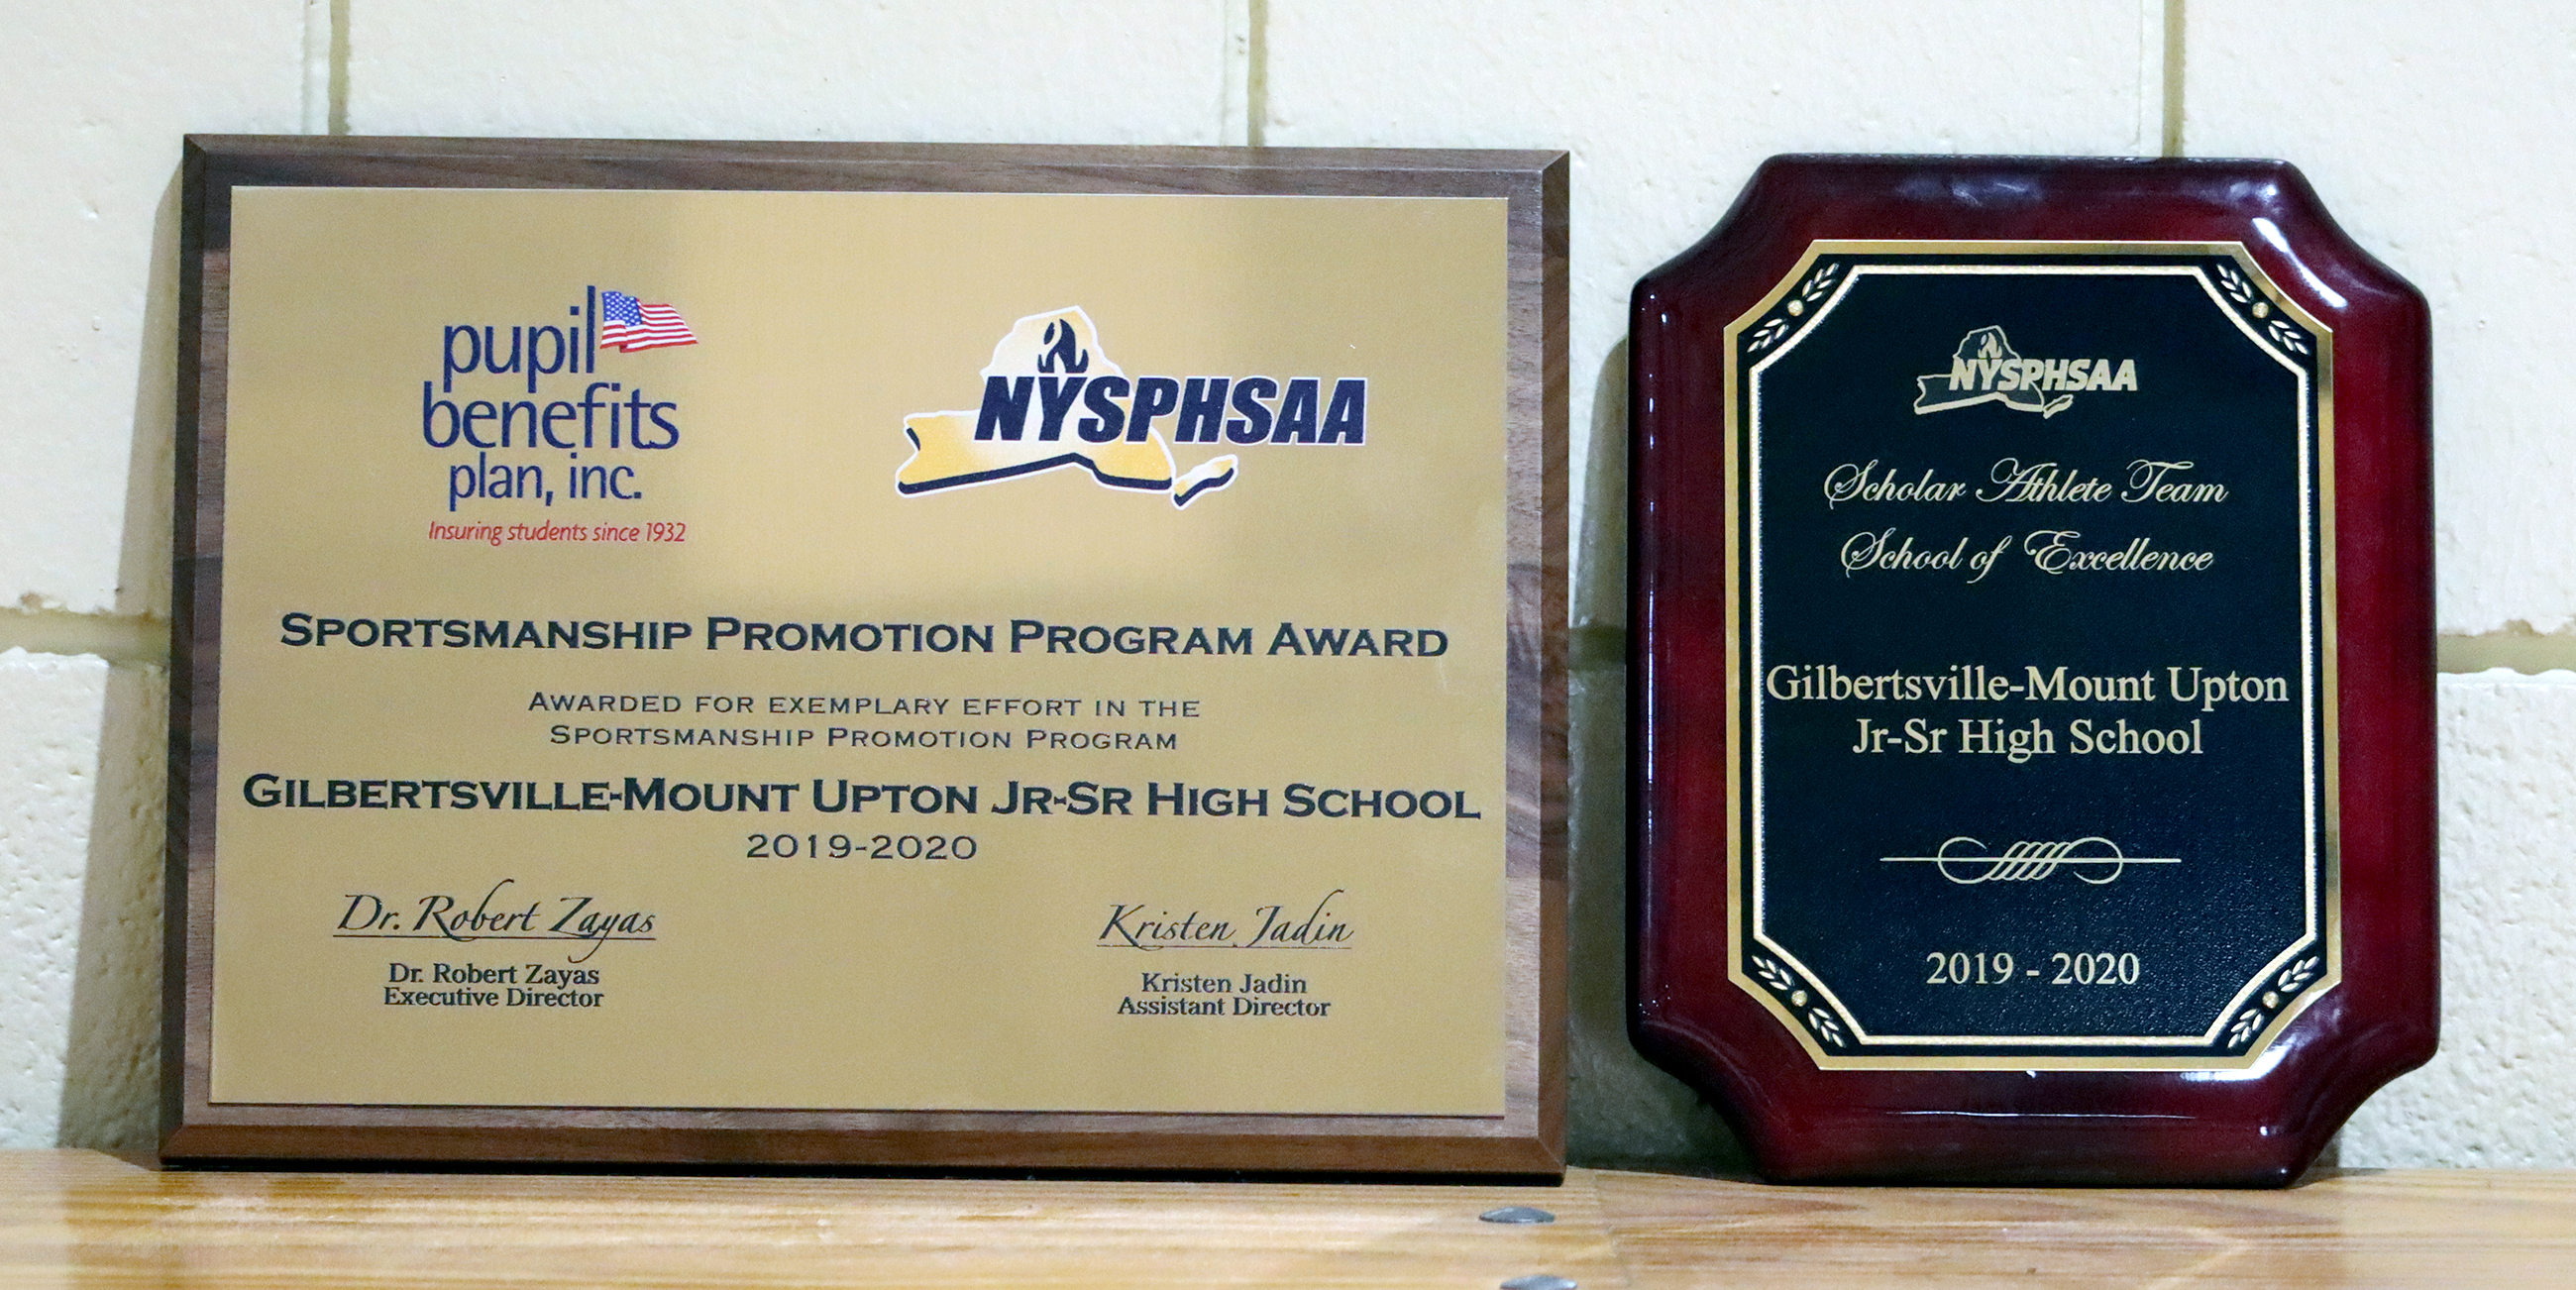 NYSPHSAA athletics awards plaques (6/2021)